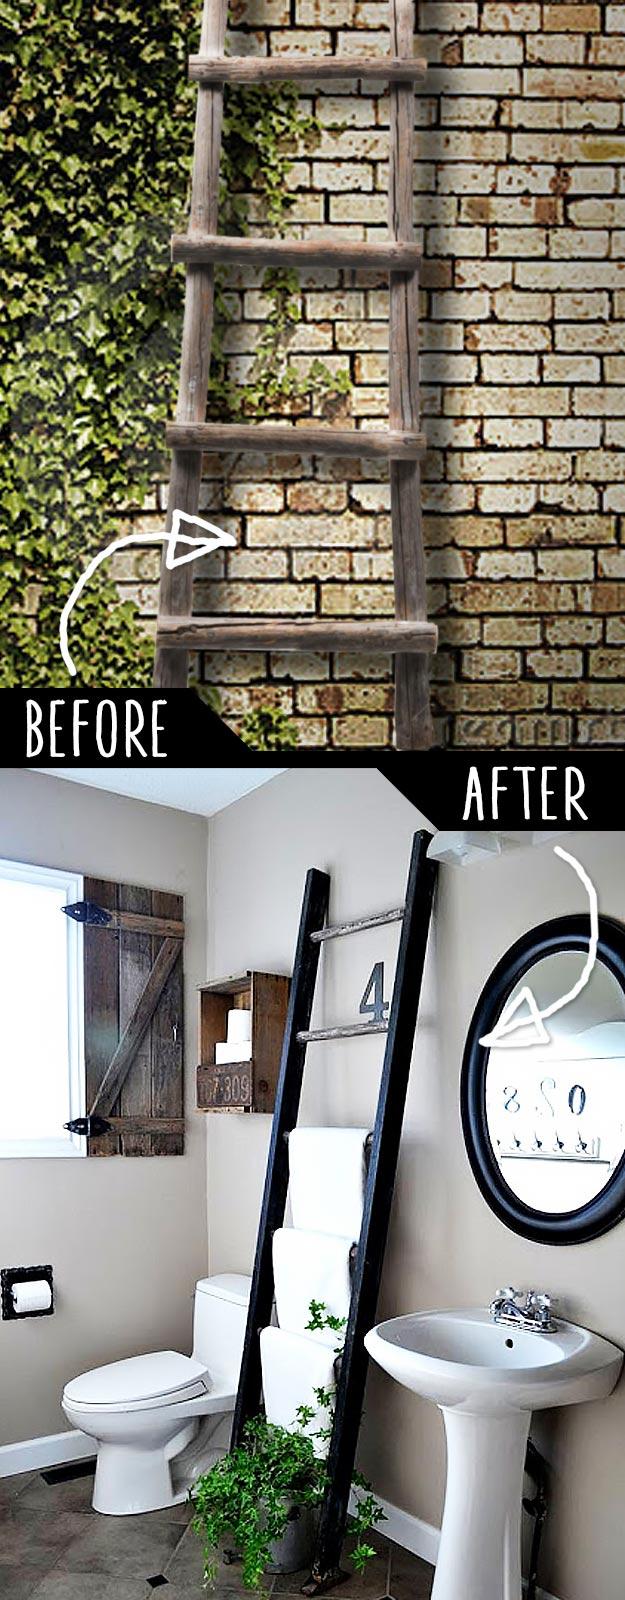 DIY Furniture Hacks | Ladder Towel Rack | Cool Ideas for Creative Do It Yourself Furniture | Cheap Home Decor Ideas for Bedroom, Bathroom, Living Room, Kitchen #diy